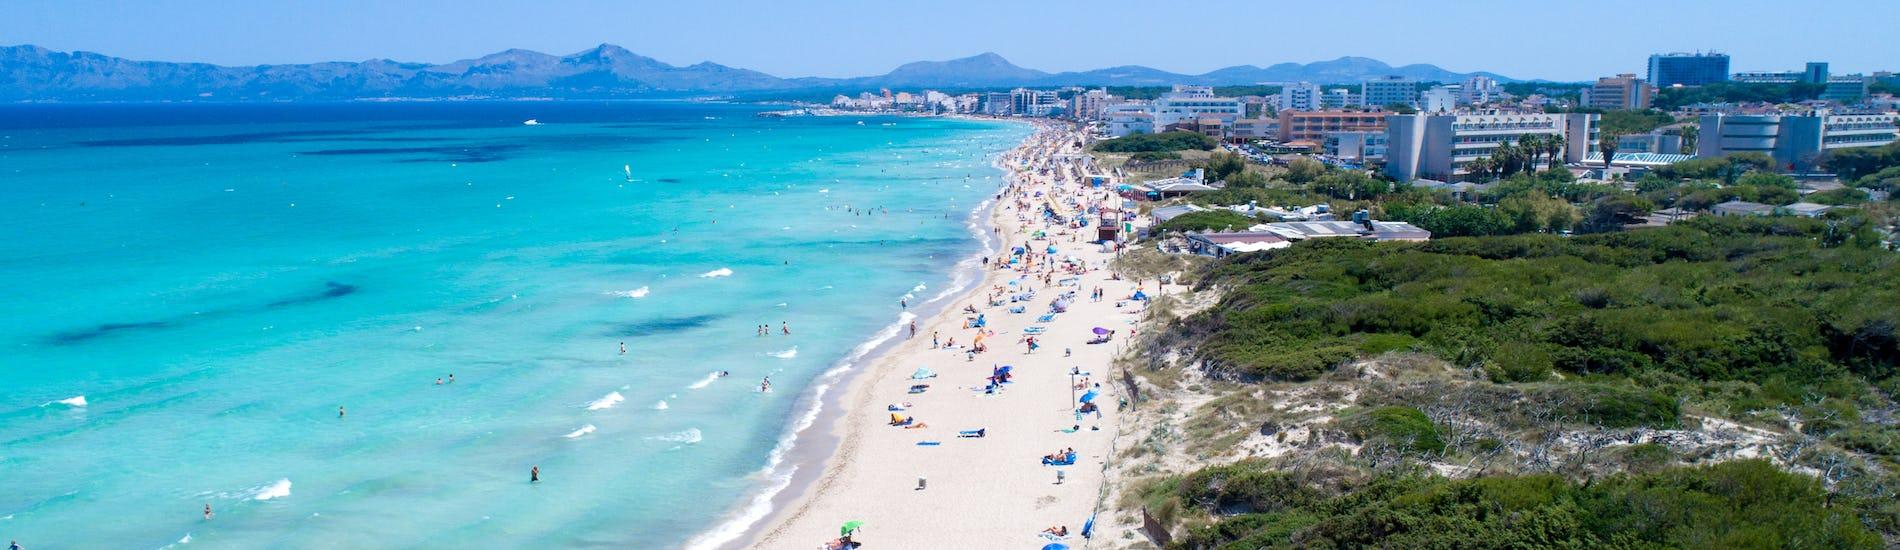 Playa de Muro Majorca Pictures, videos & insider tips